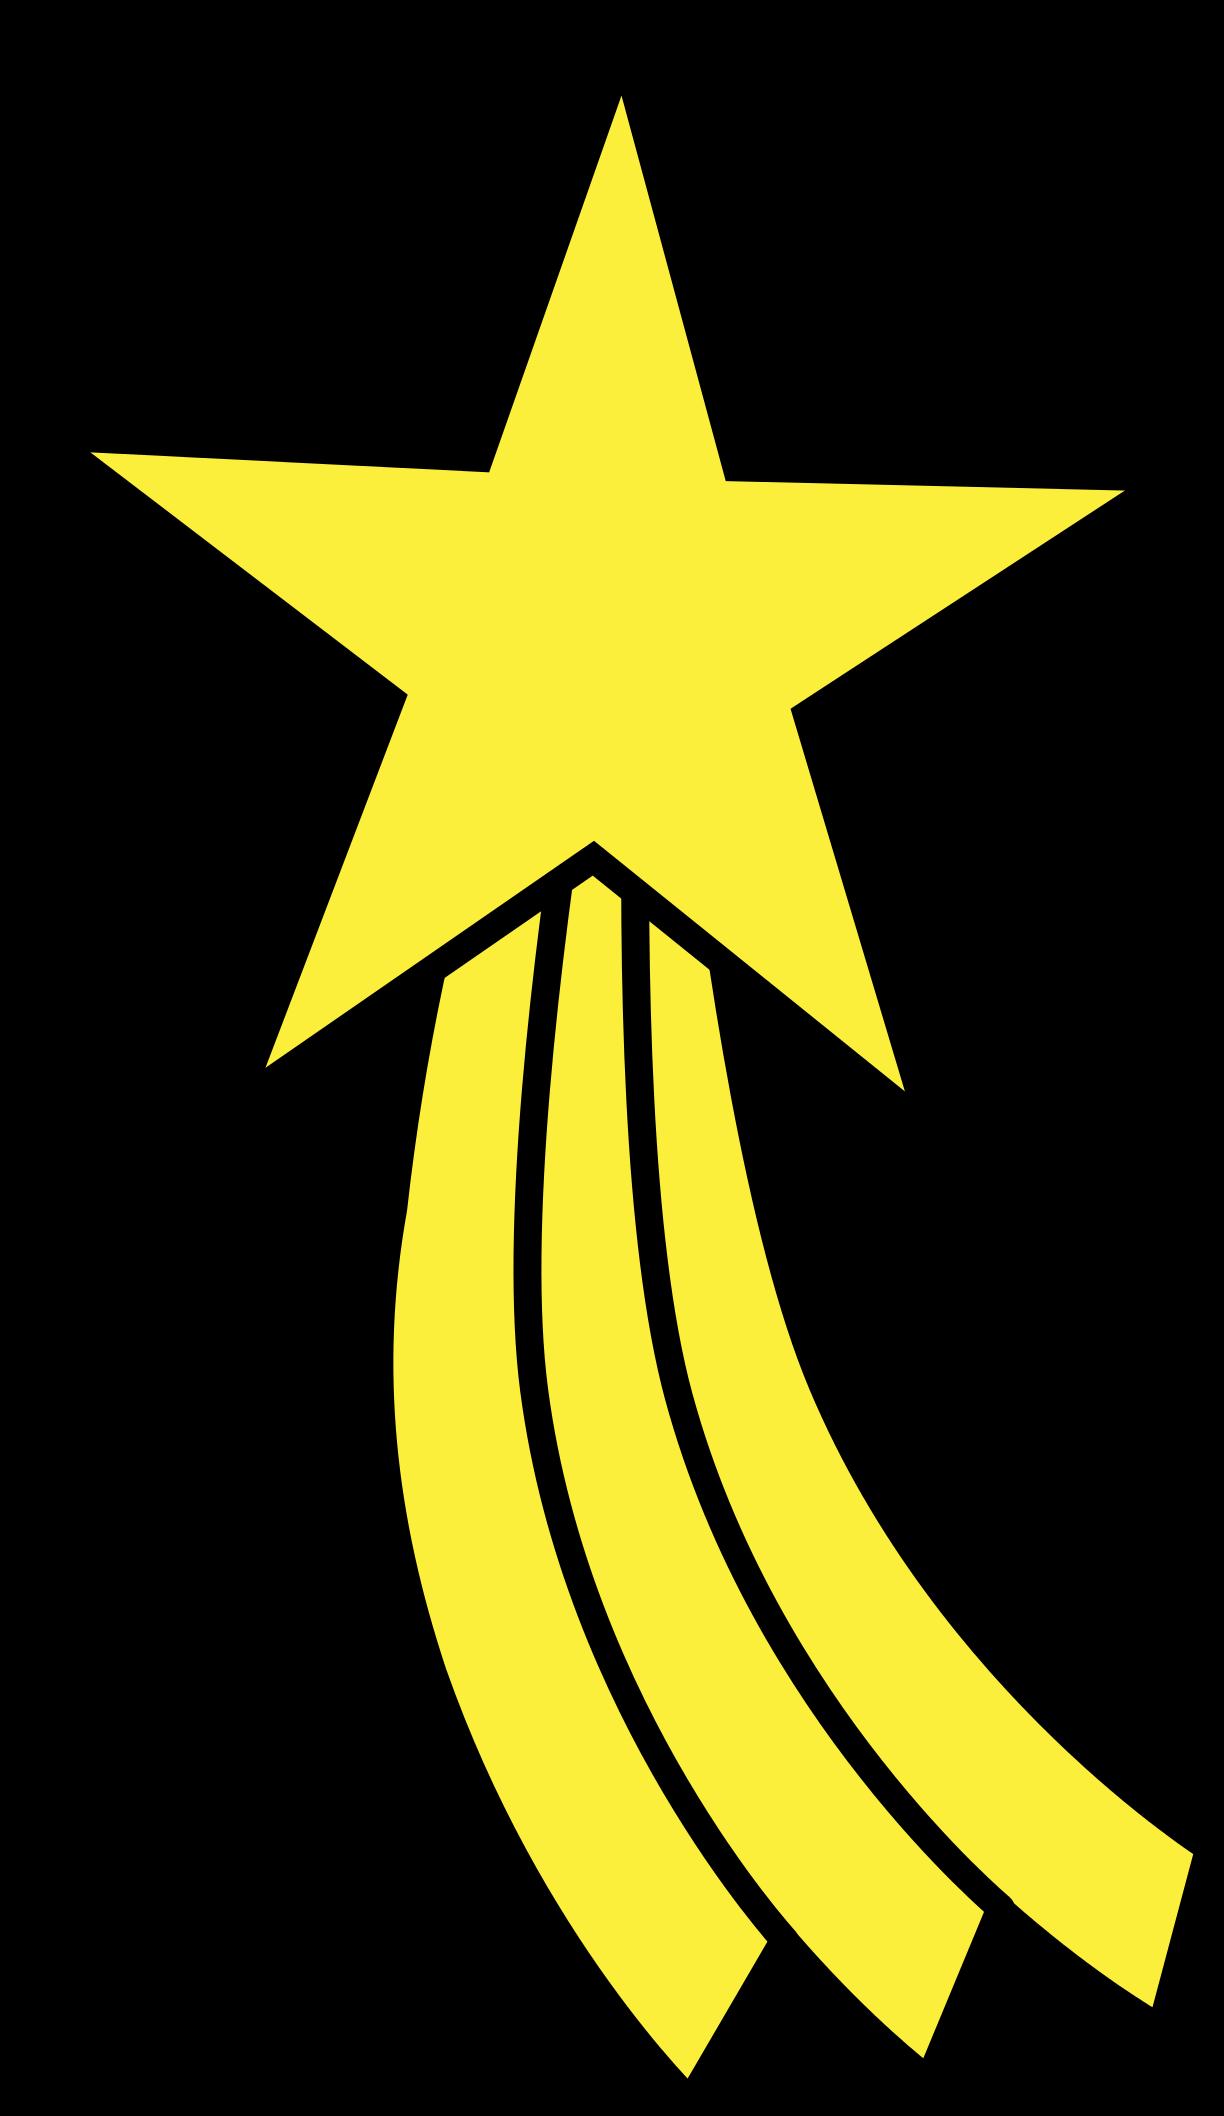 Comet Clipart Svg.